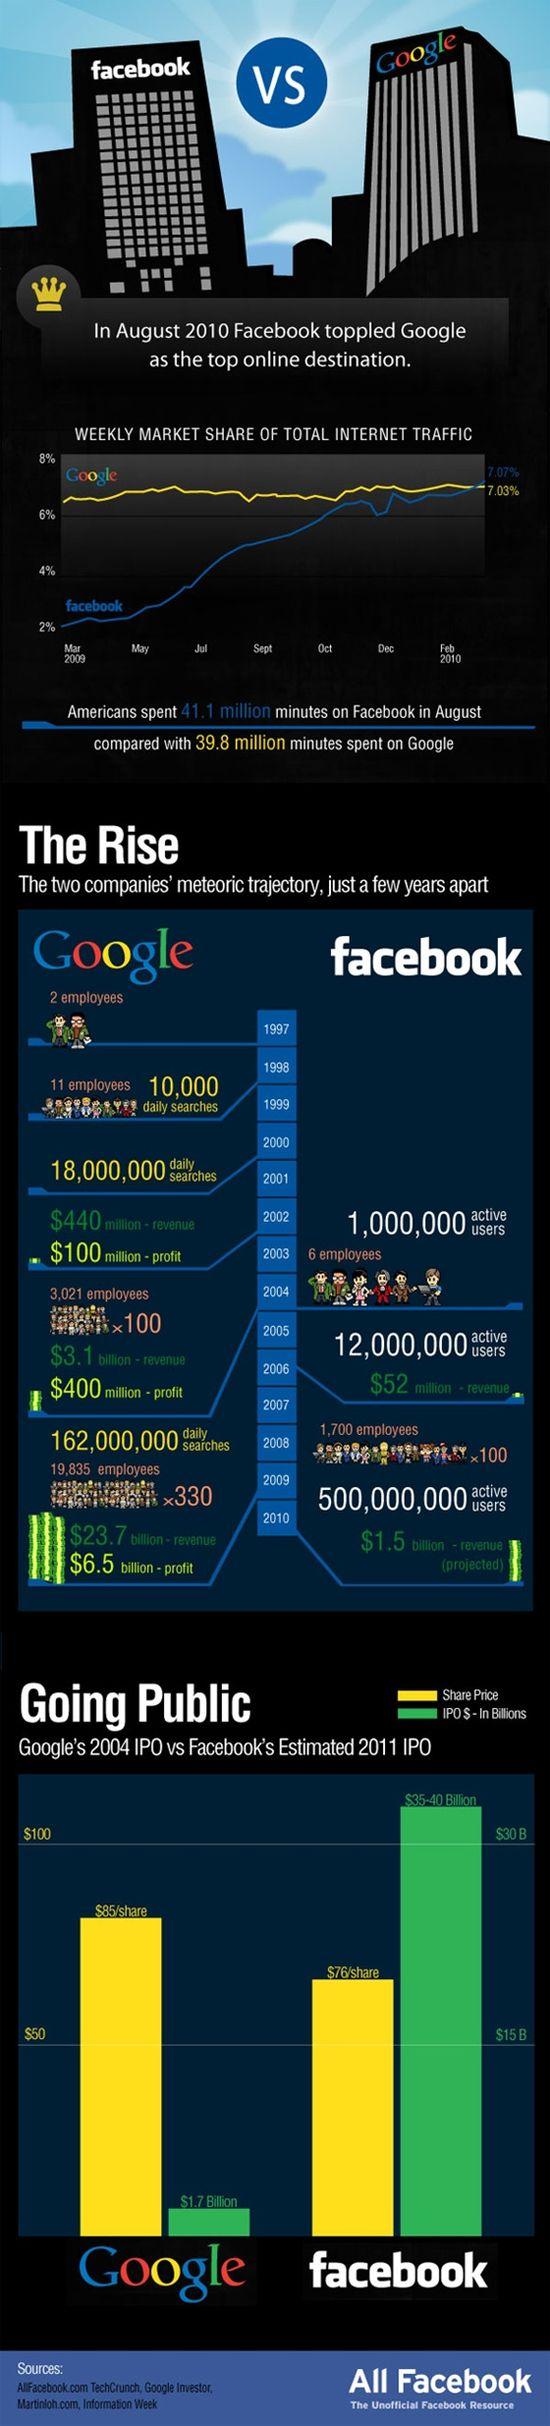 Facebook vs google infographic